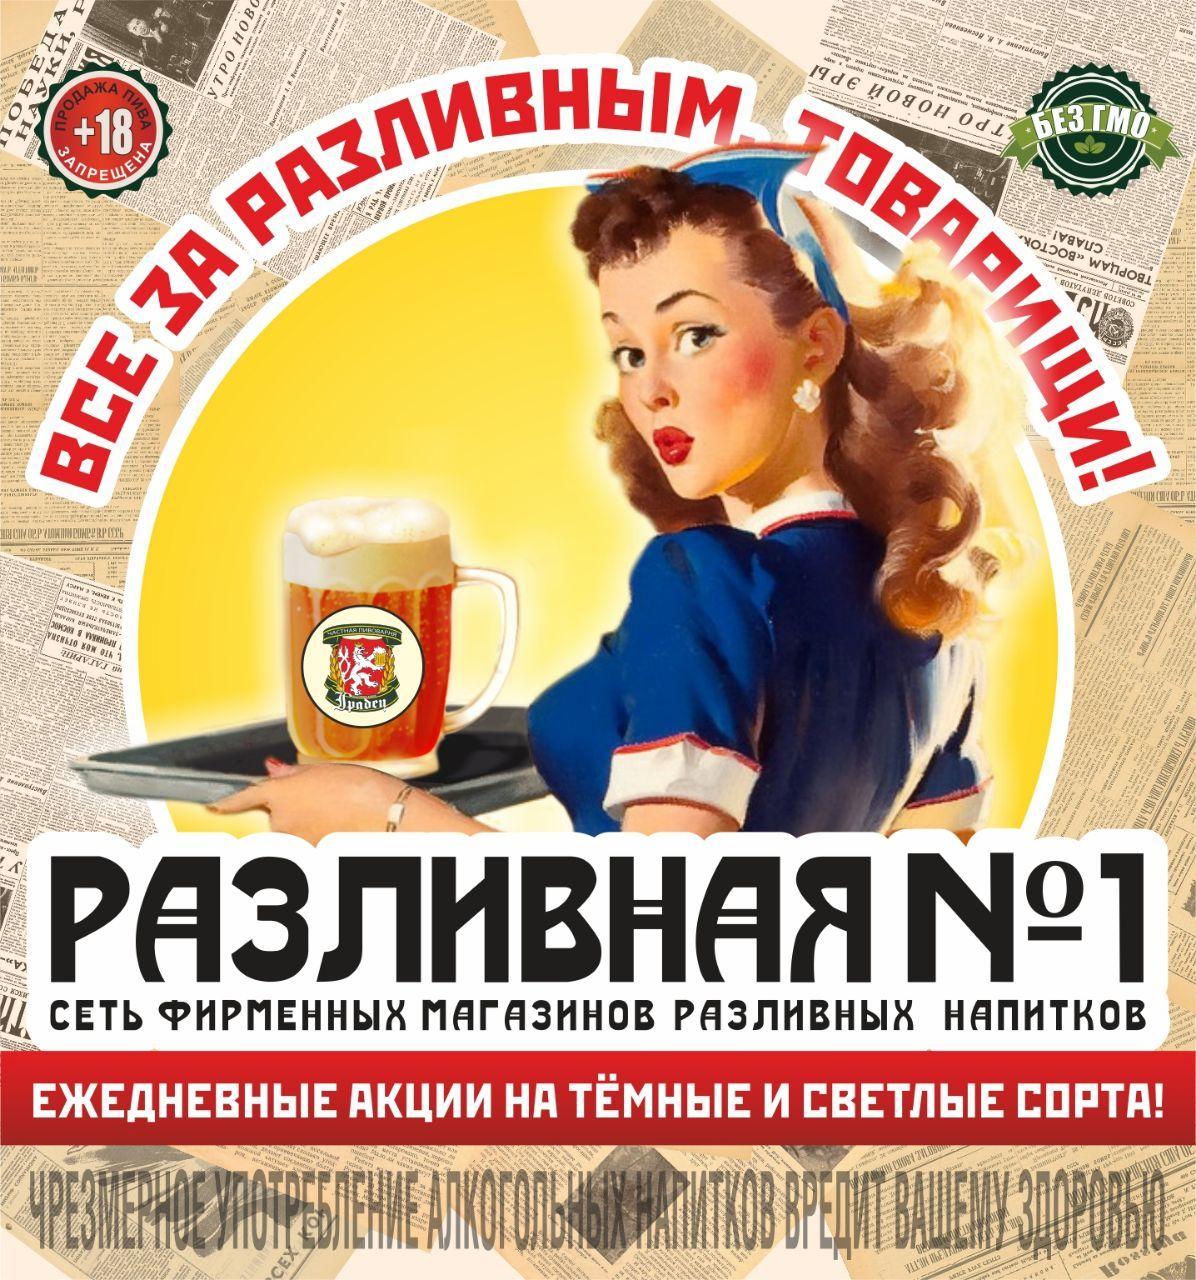 ИП Кудрявцев